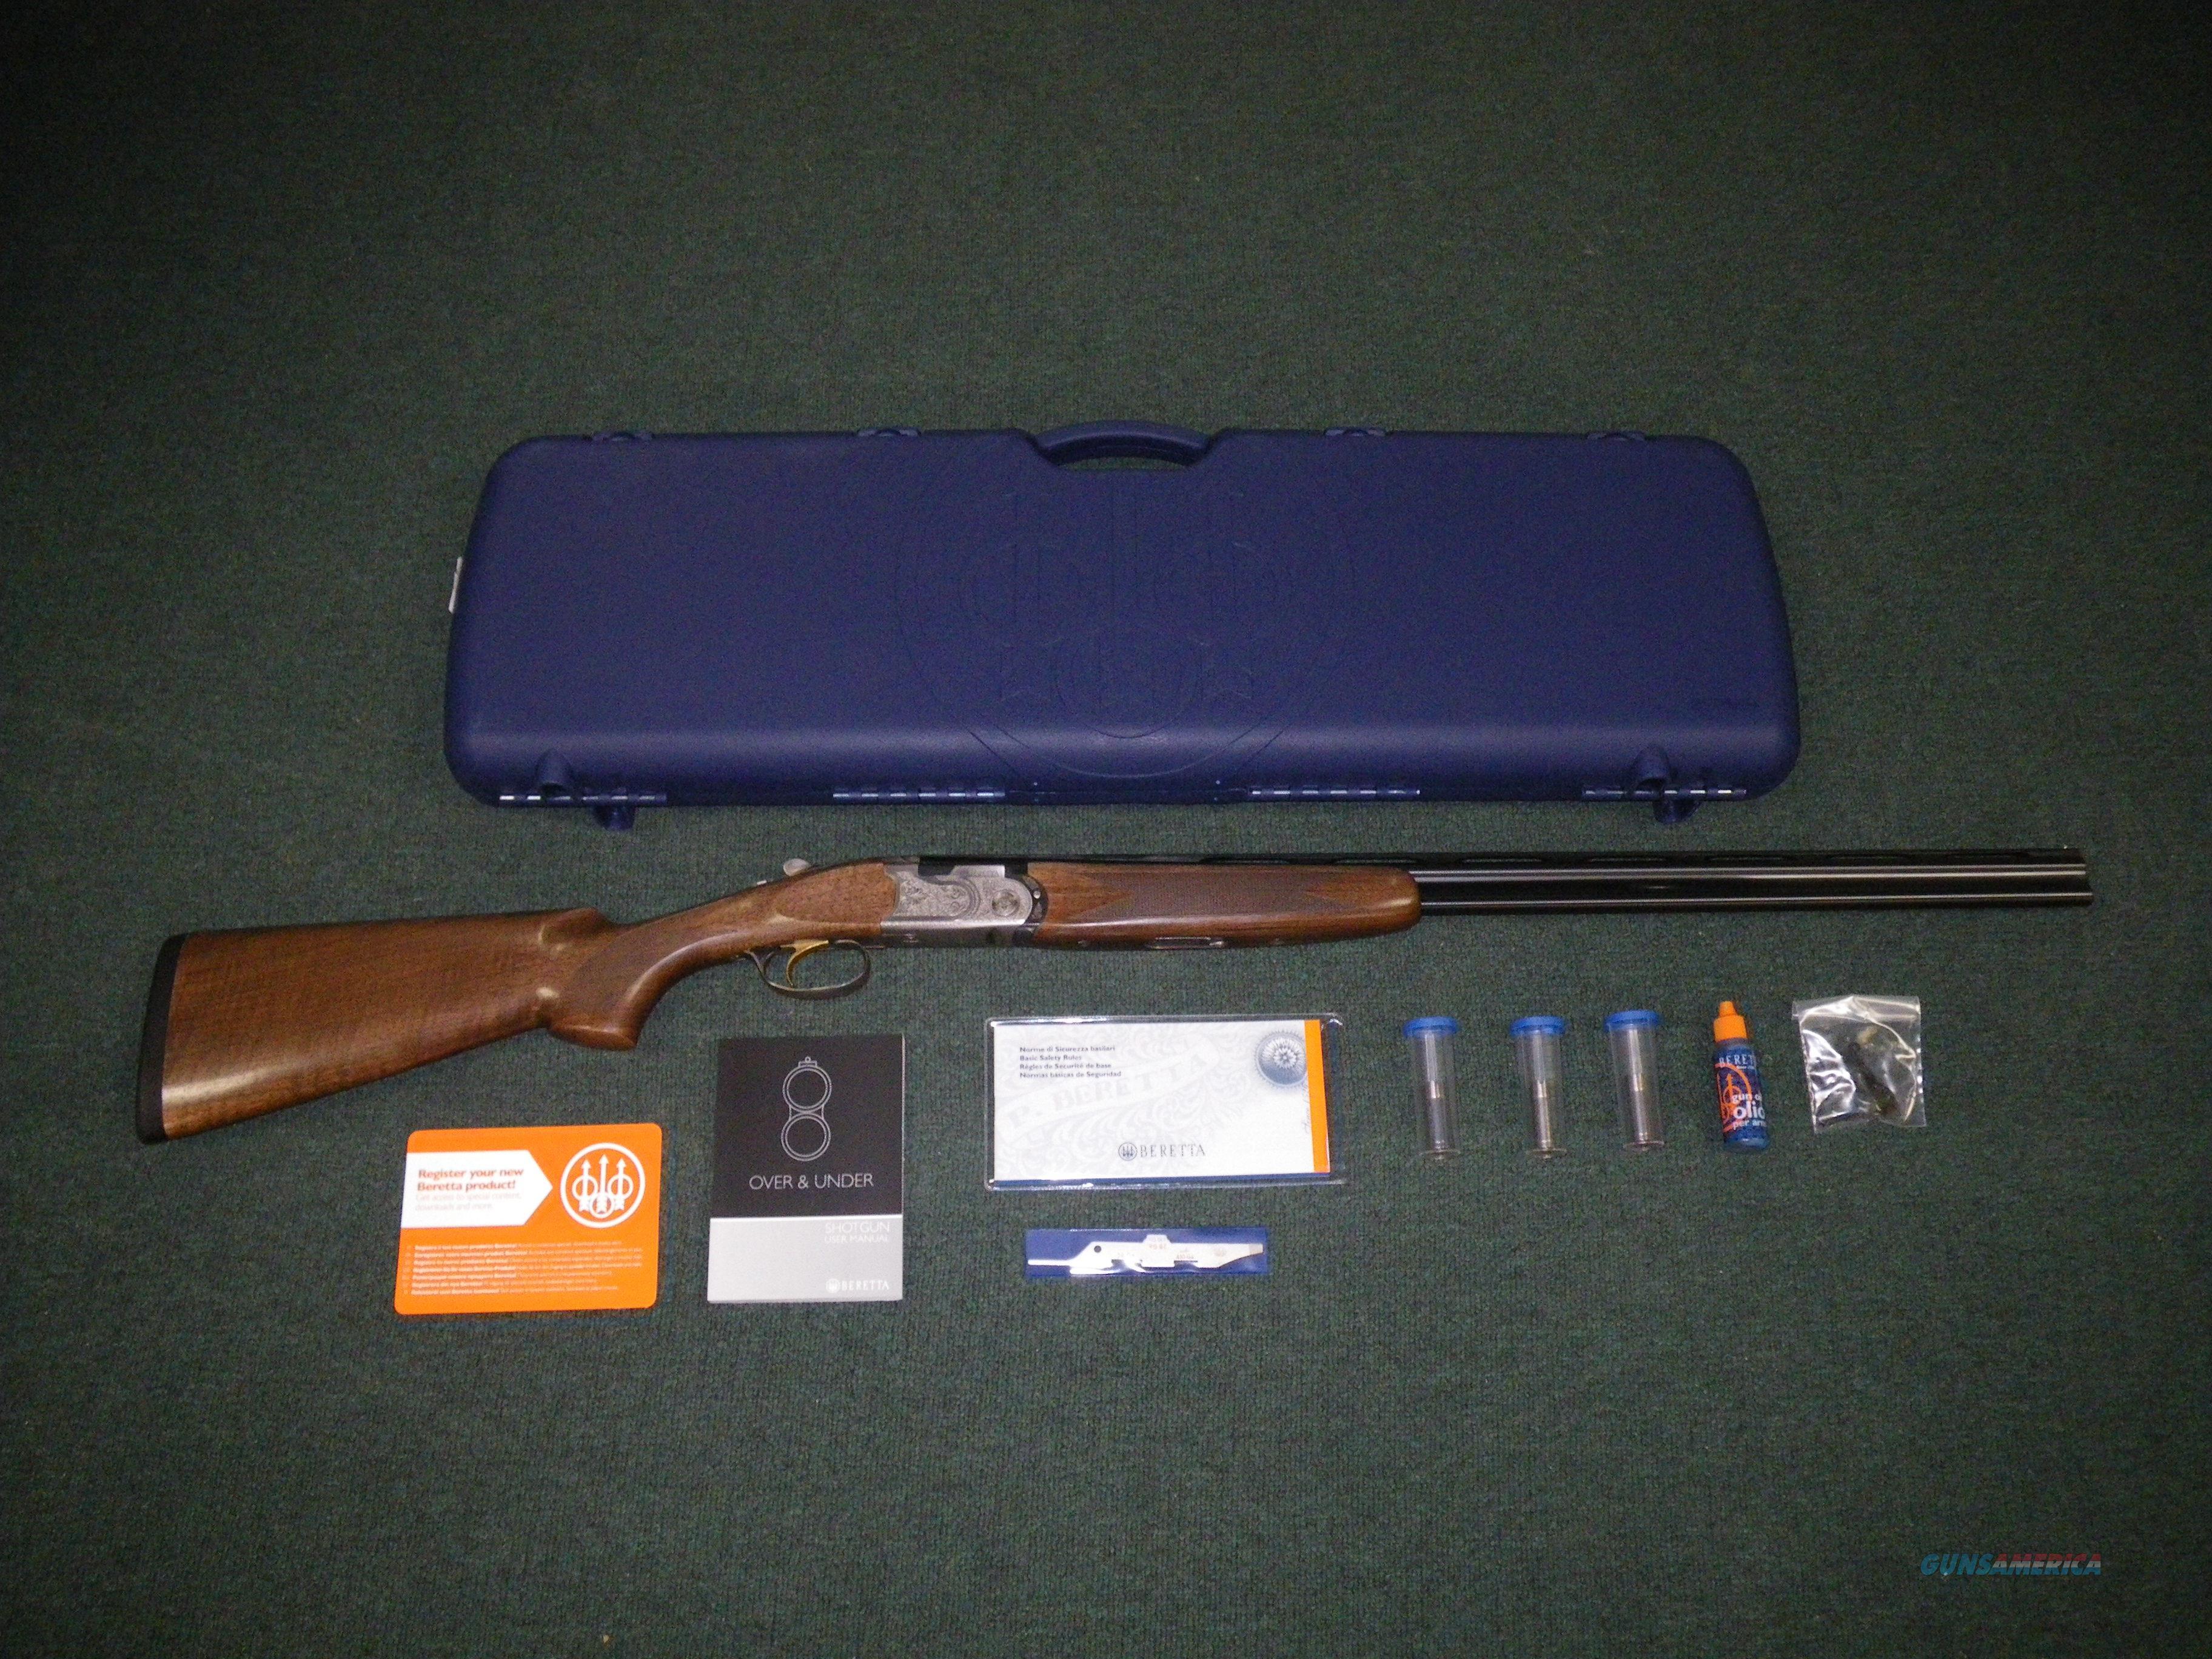 "Beretta 686 Silver Pigeon I 410 28"" 3"" Chamber NEW #J6863N8  Guns > Shotguns > Beretta Shotguns > O/U > Hunting"